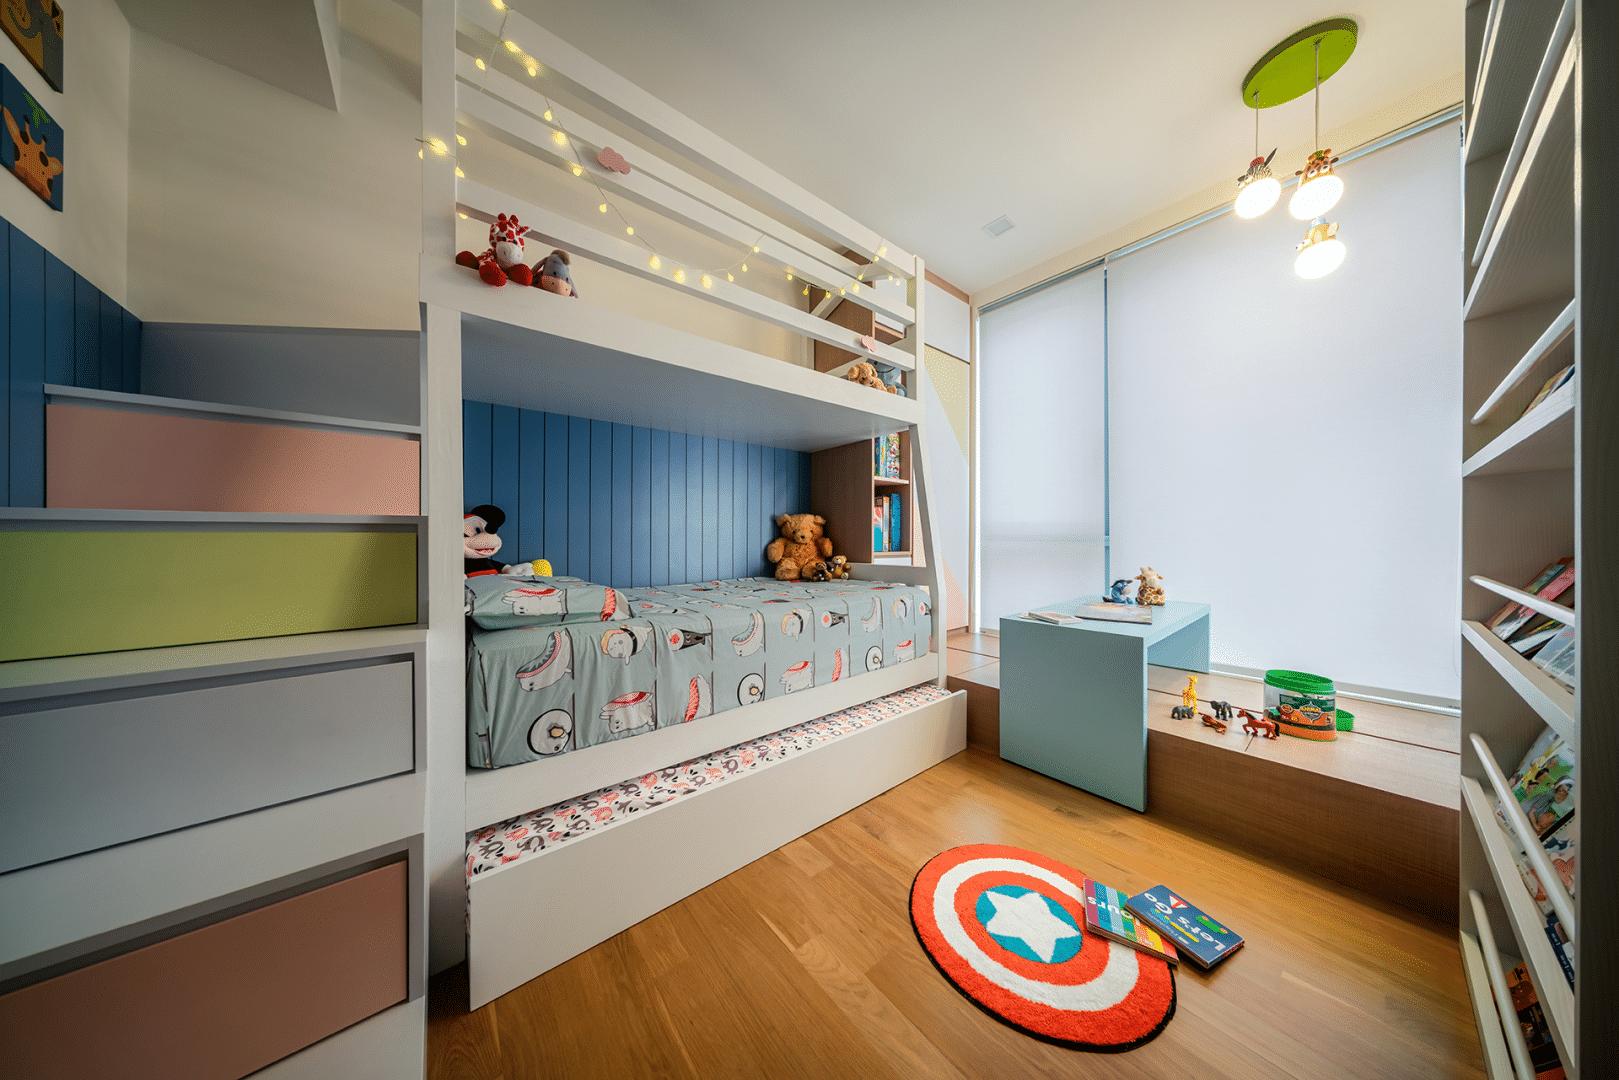 9 غرف اطفال مودرن فاخرة